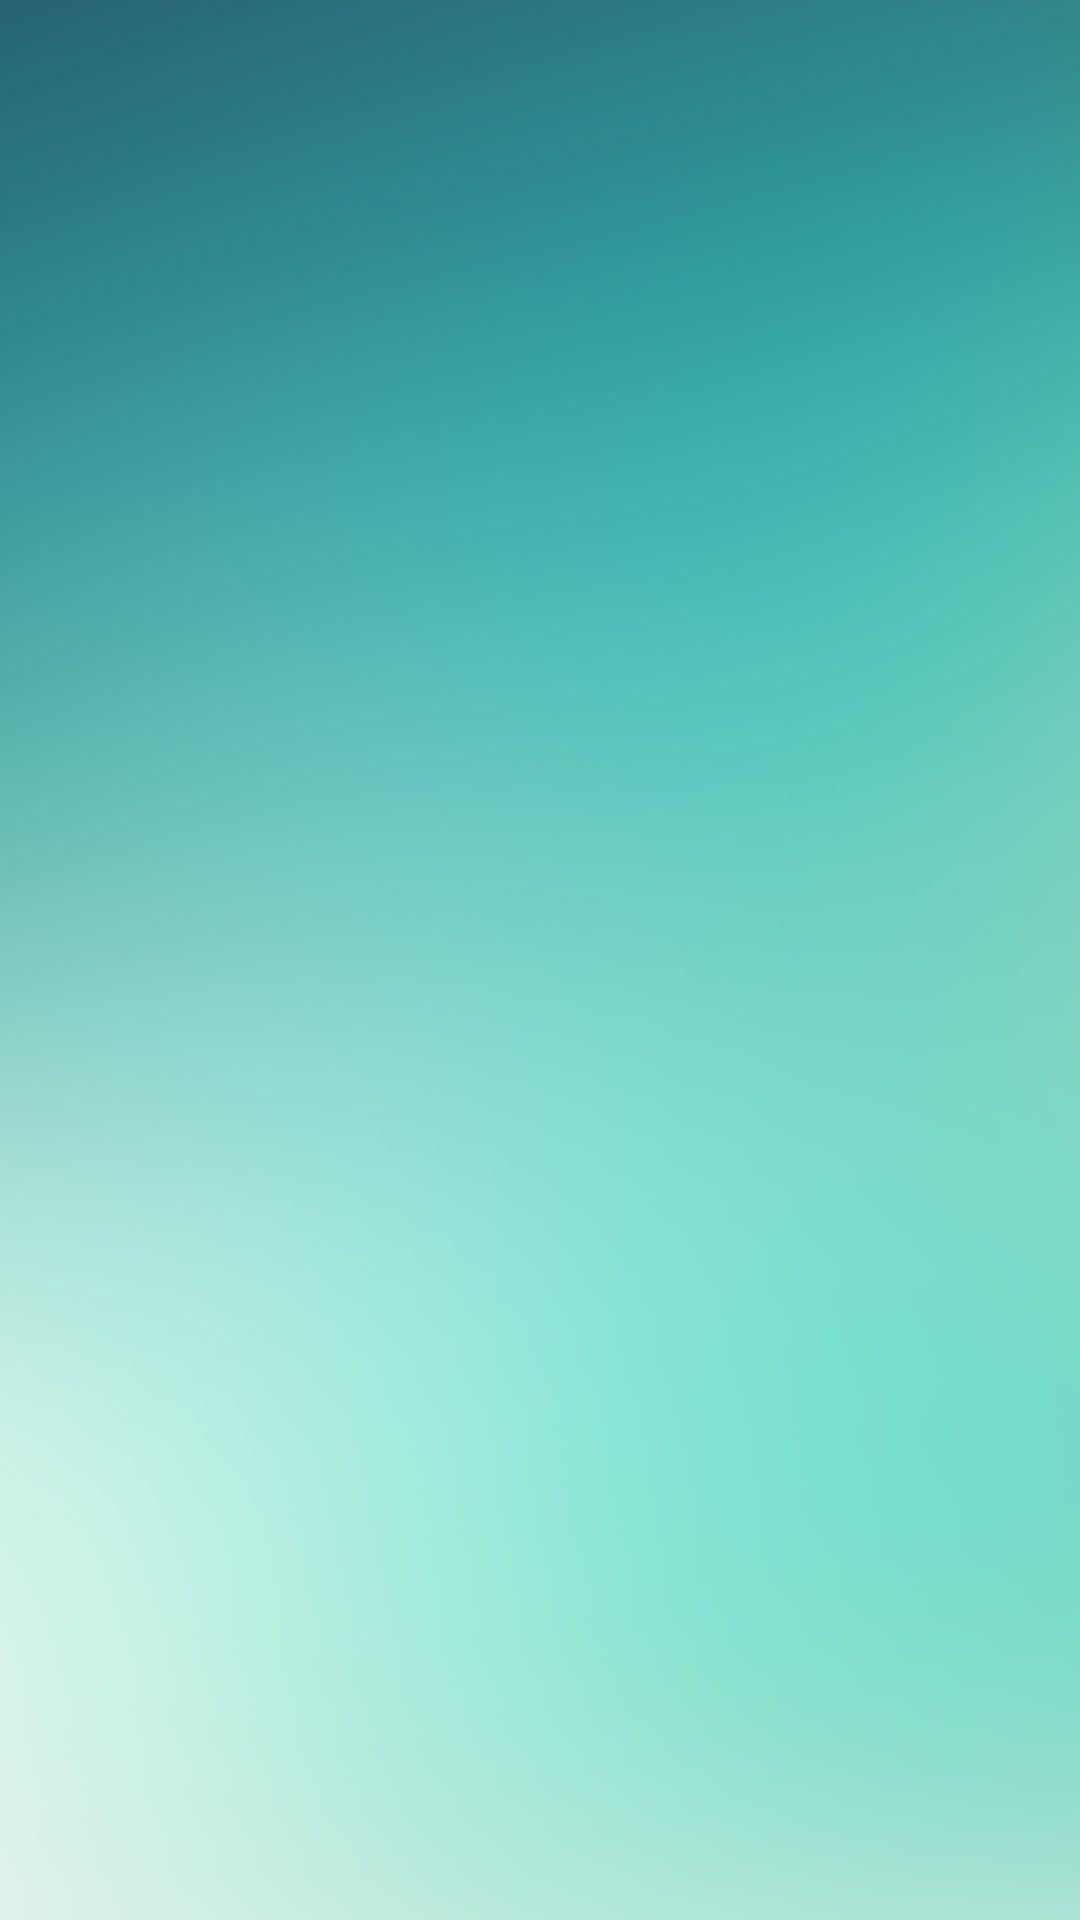 Plain Color Iphone Wallpapers Wallpaper Cave